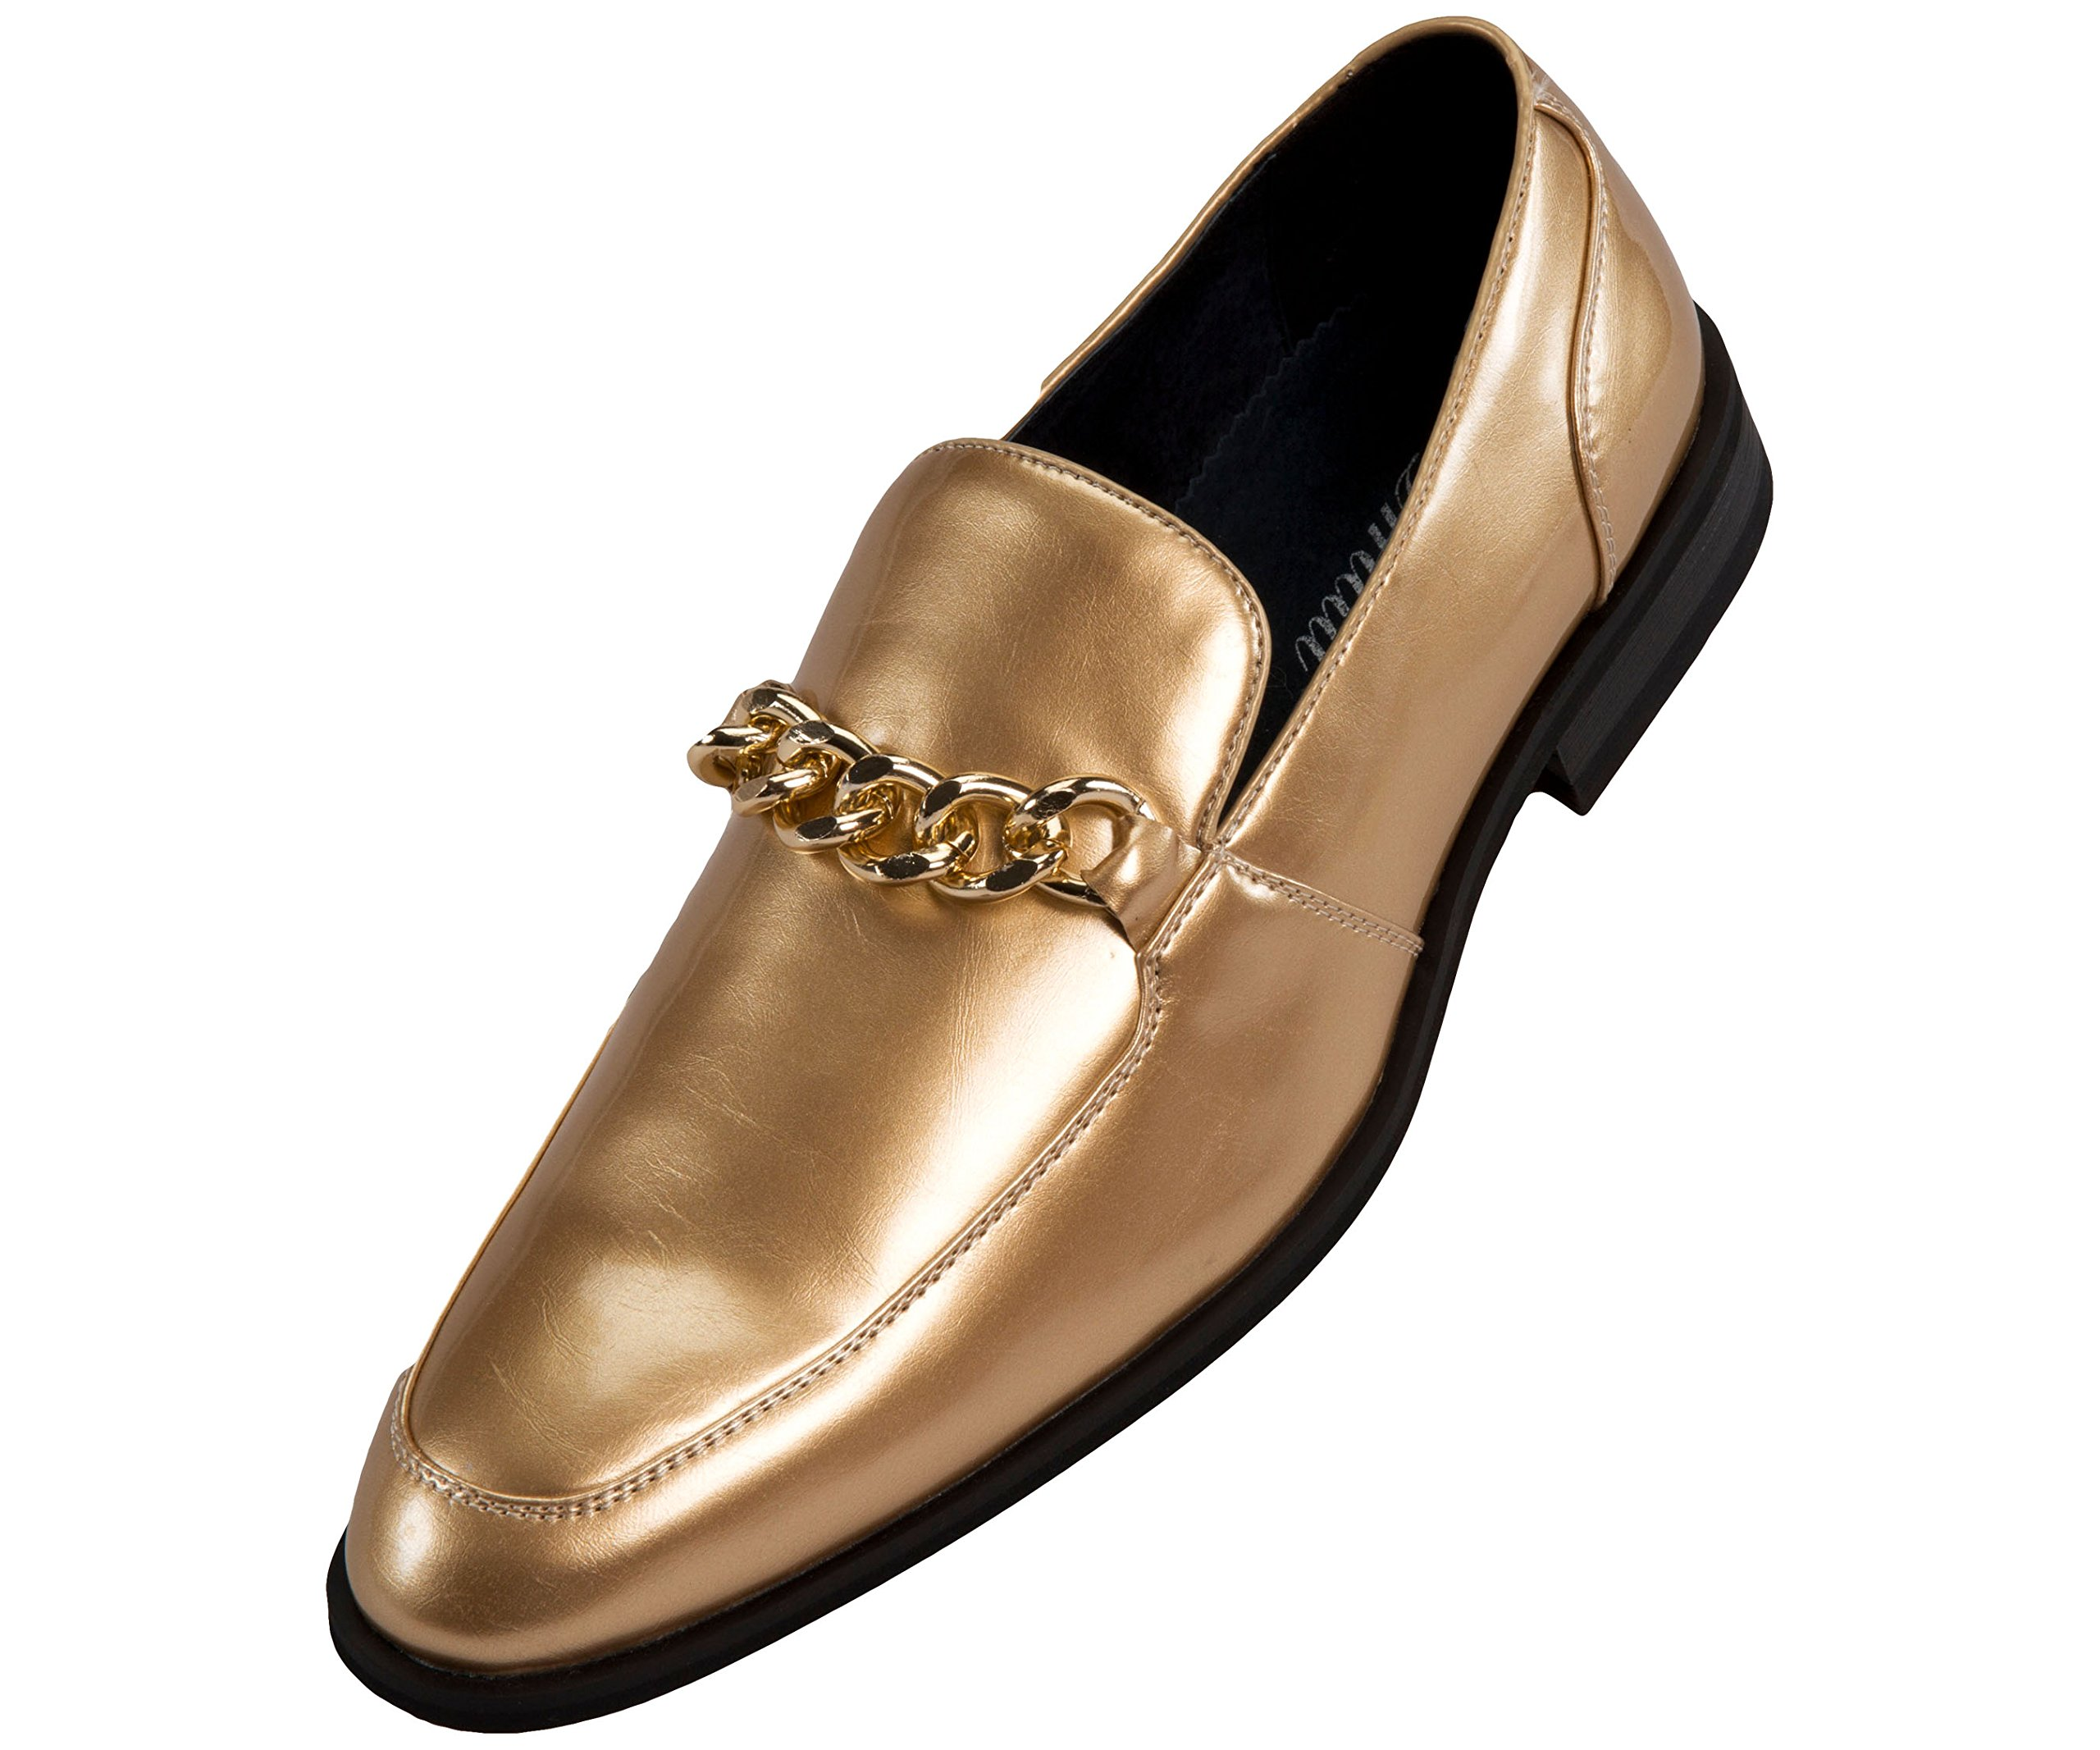 Amali Mens Microfiber & Patent Slip On Dress Shoe with Large Chain Style Vino/Gino